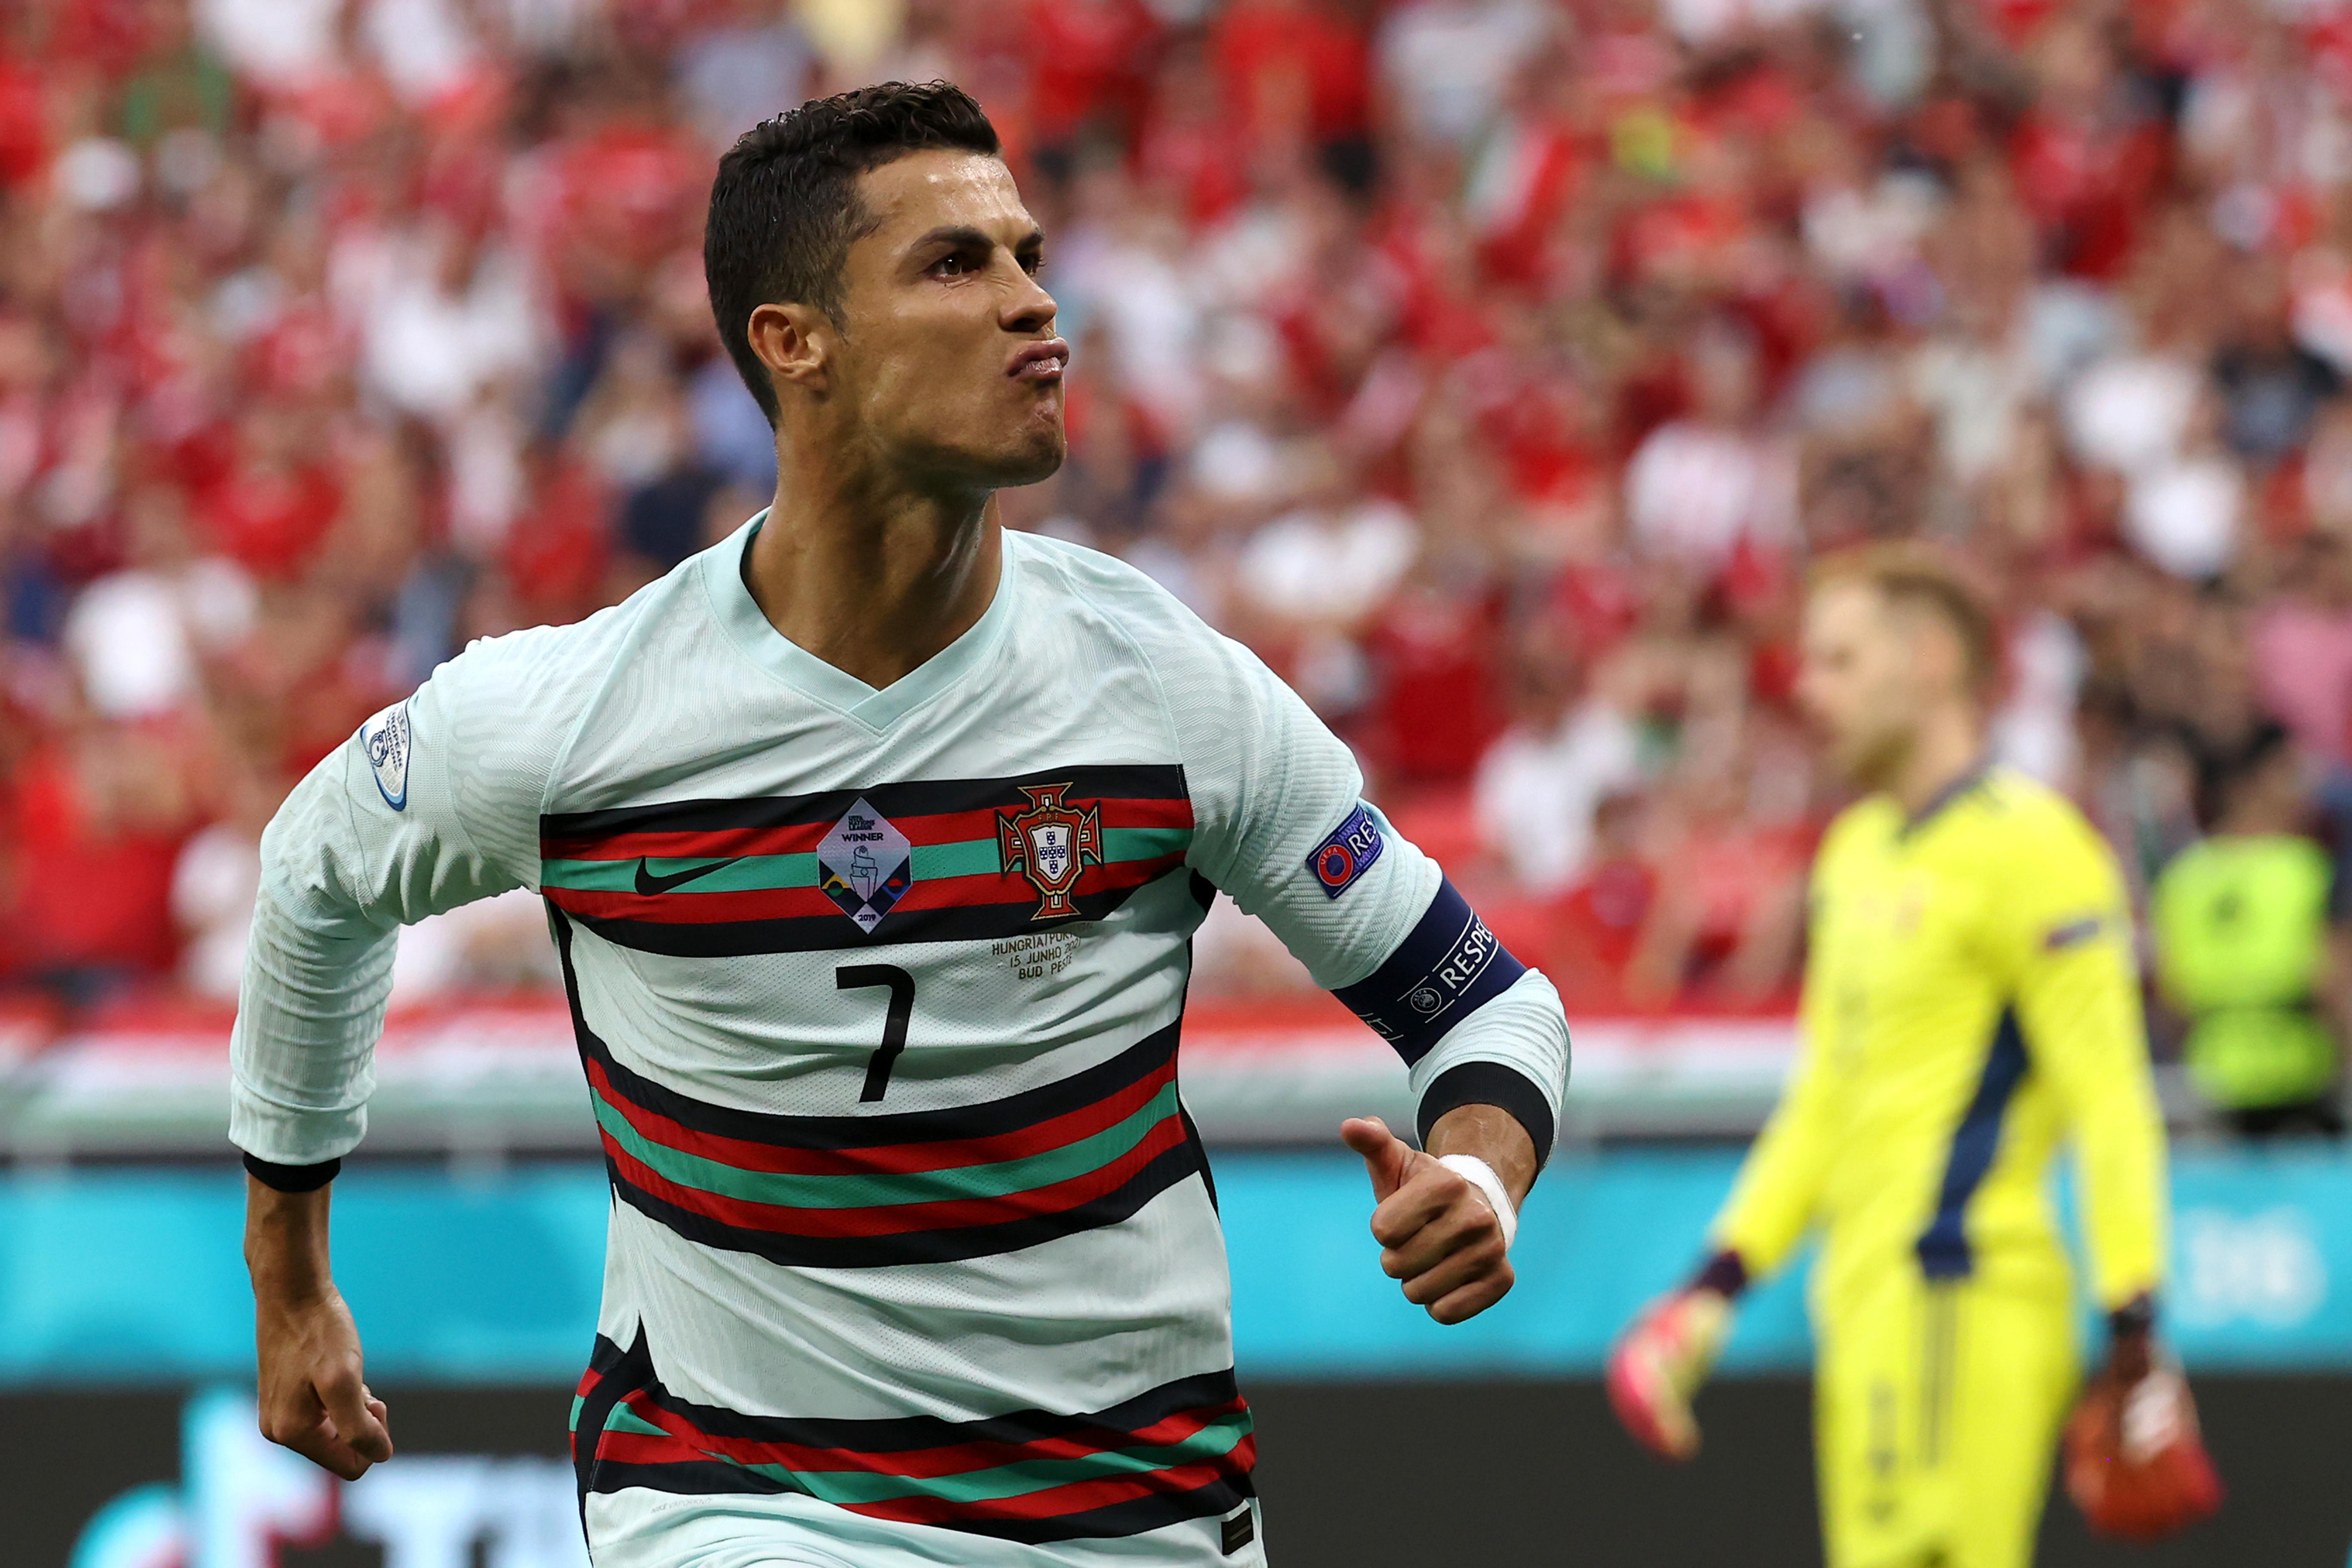 Ronaldo, Pogba Snub Sponsors at Euro 2020